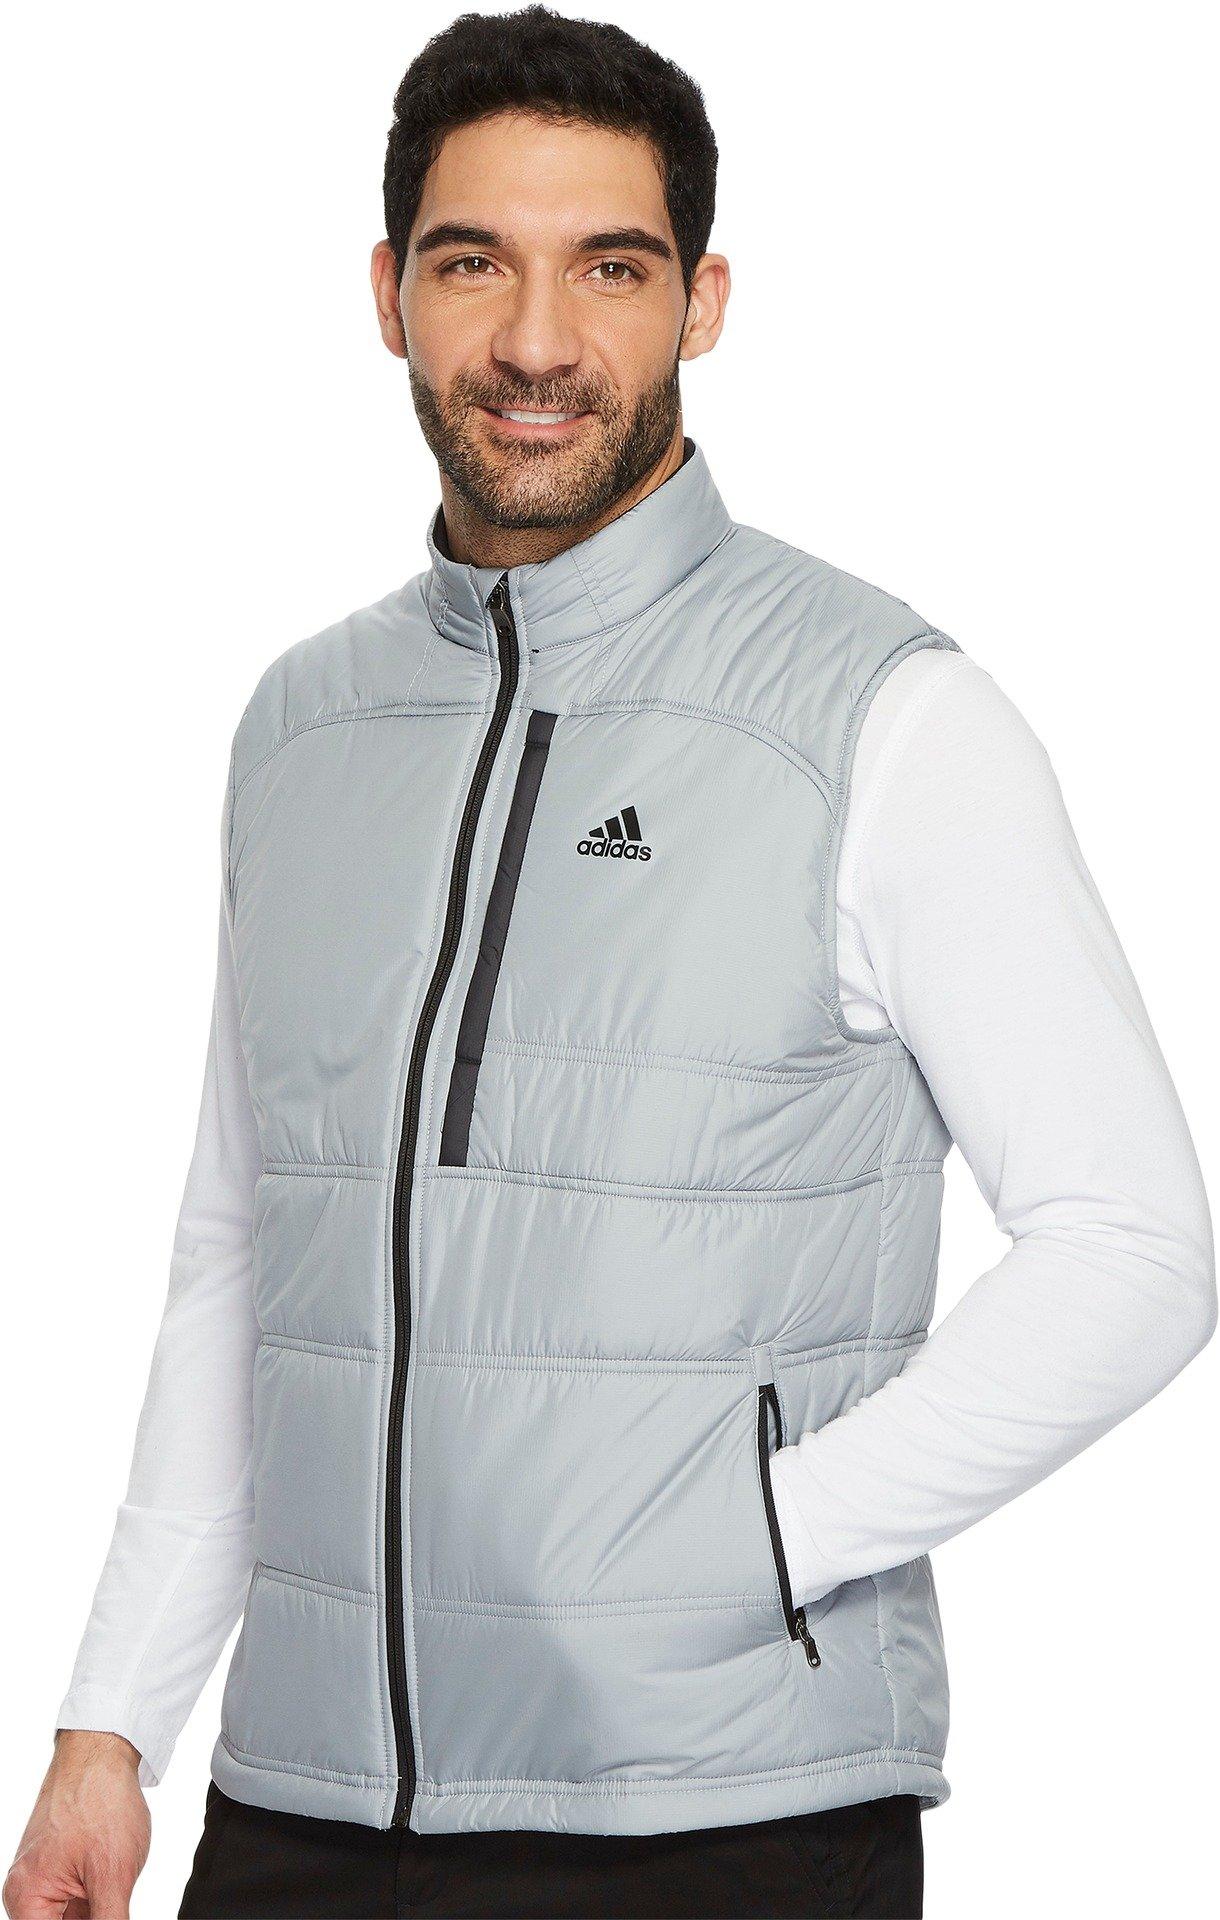 adidas Golf Men's Climaheat Primaloft Full Zip Vest, Mid Grey, XX-Large by adidas (Image #1)